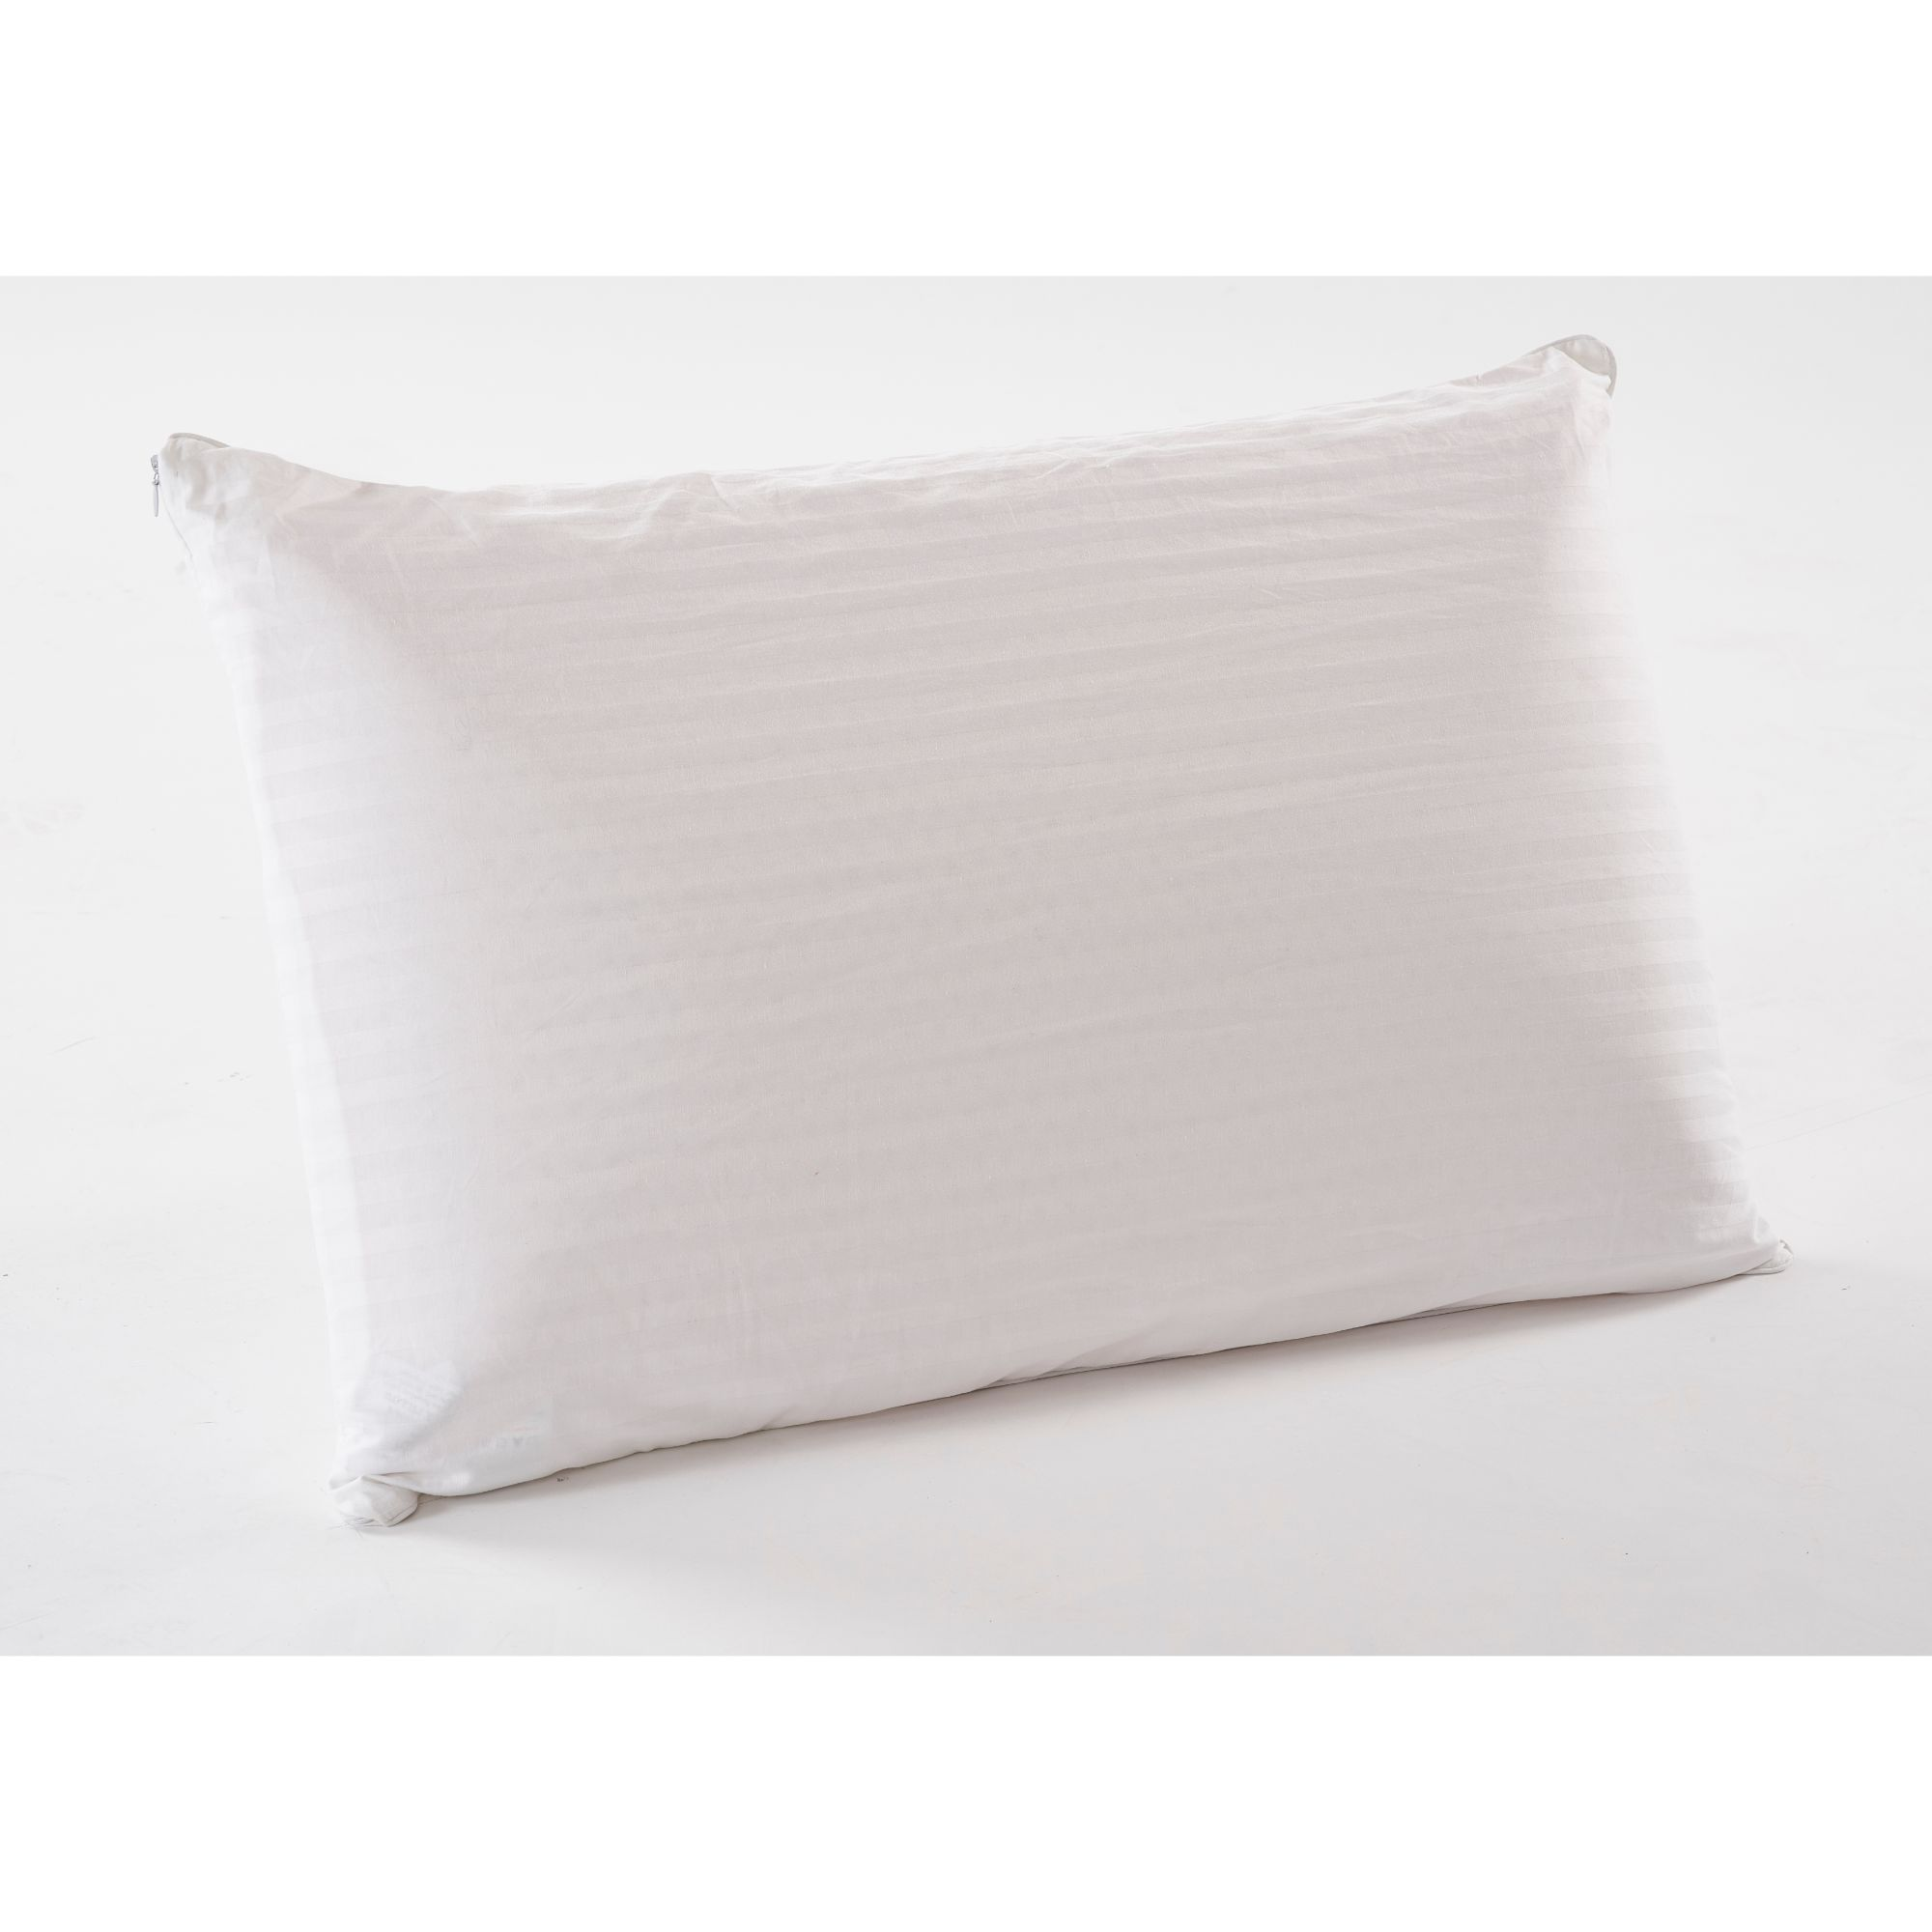 Serenity Deluxe Pillow